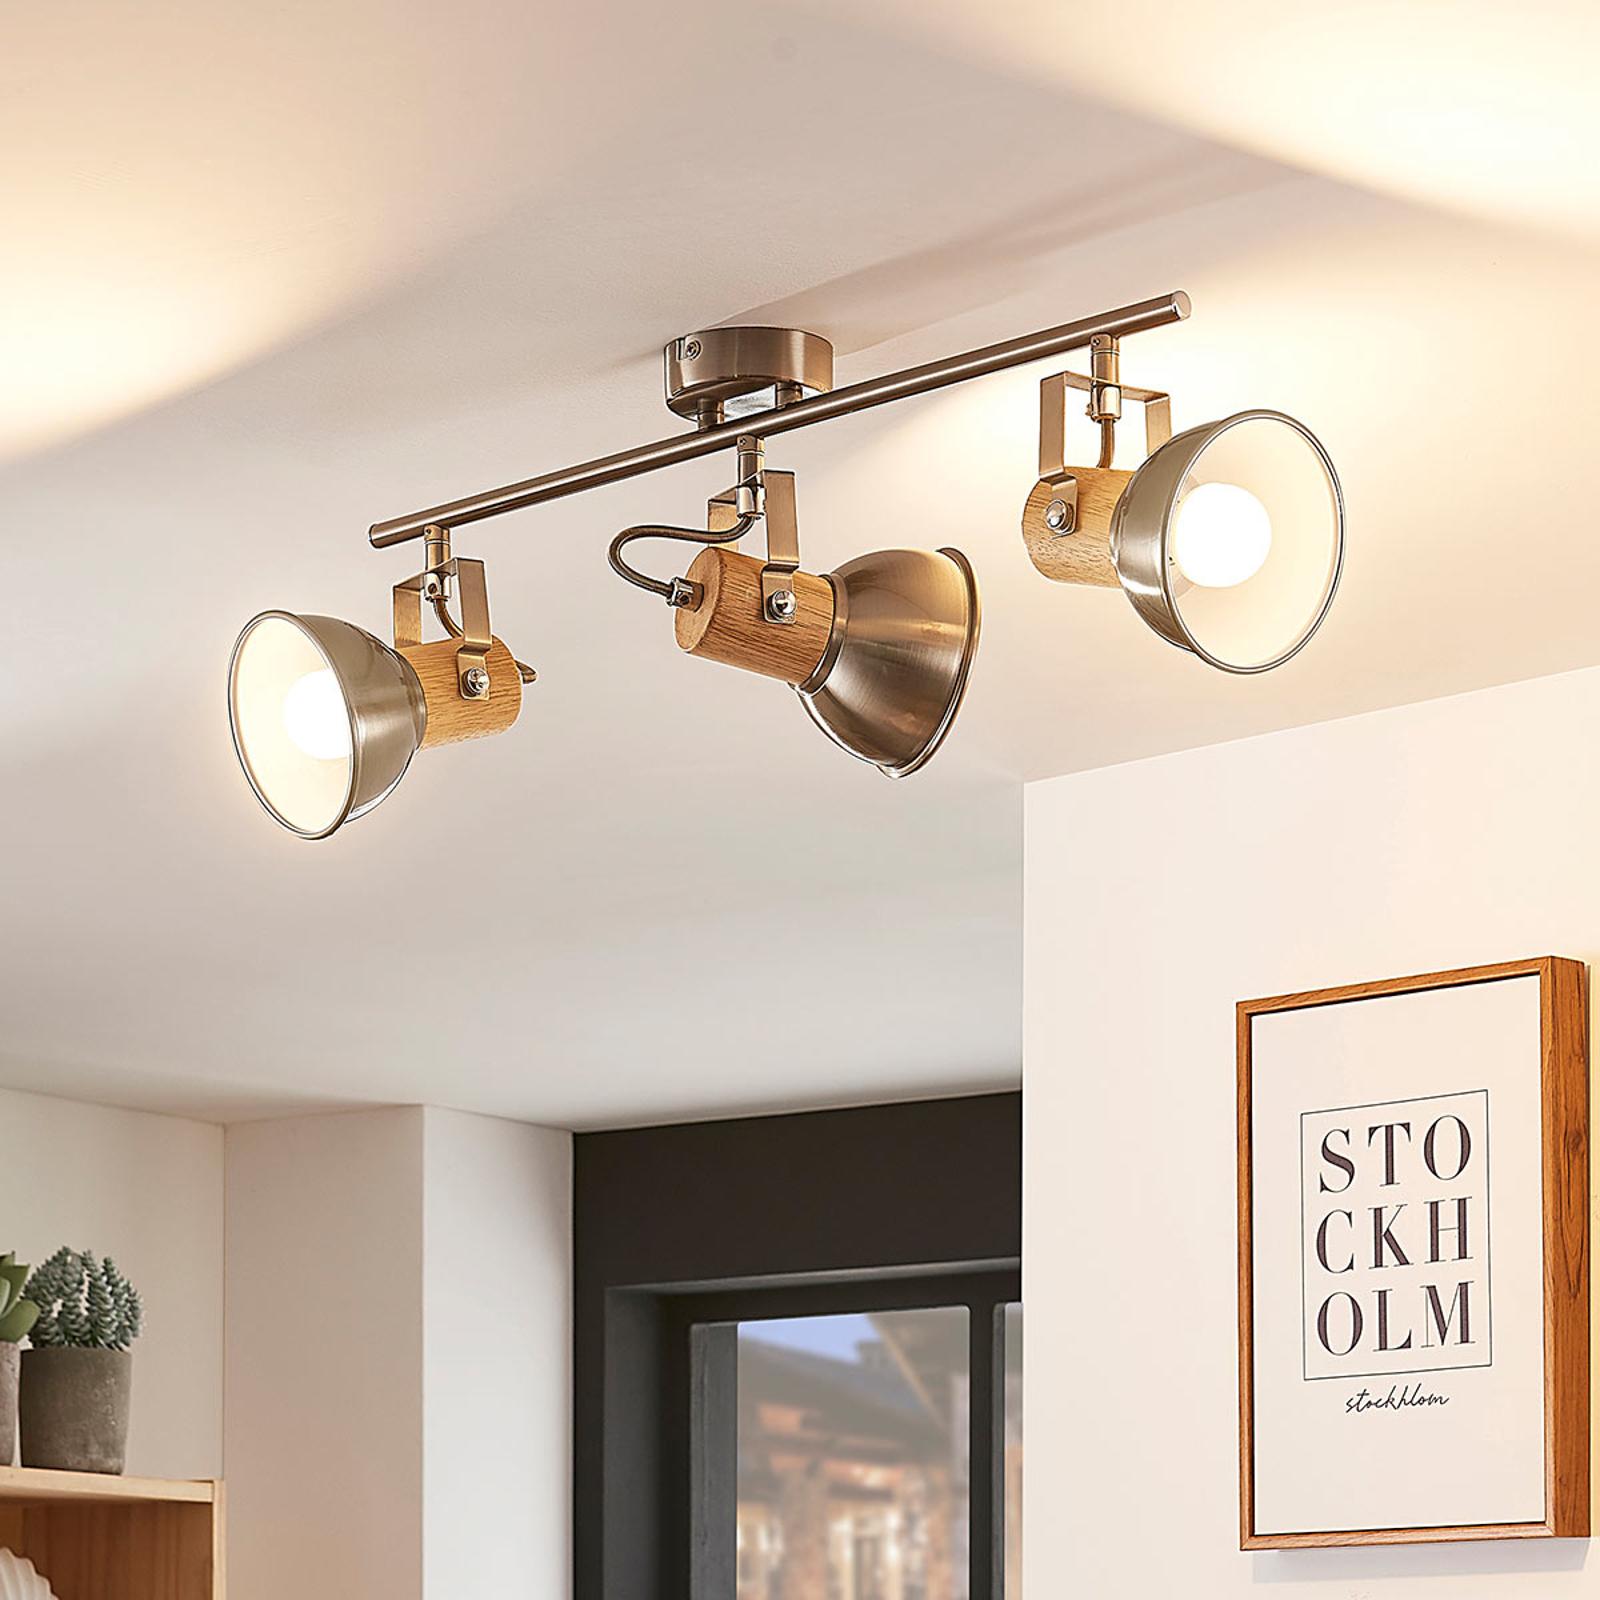 Dennis - avlang LED-taklampe med 3 lyskilder